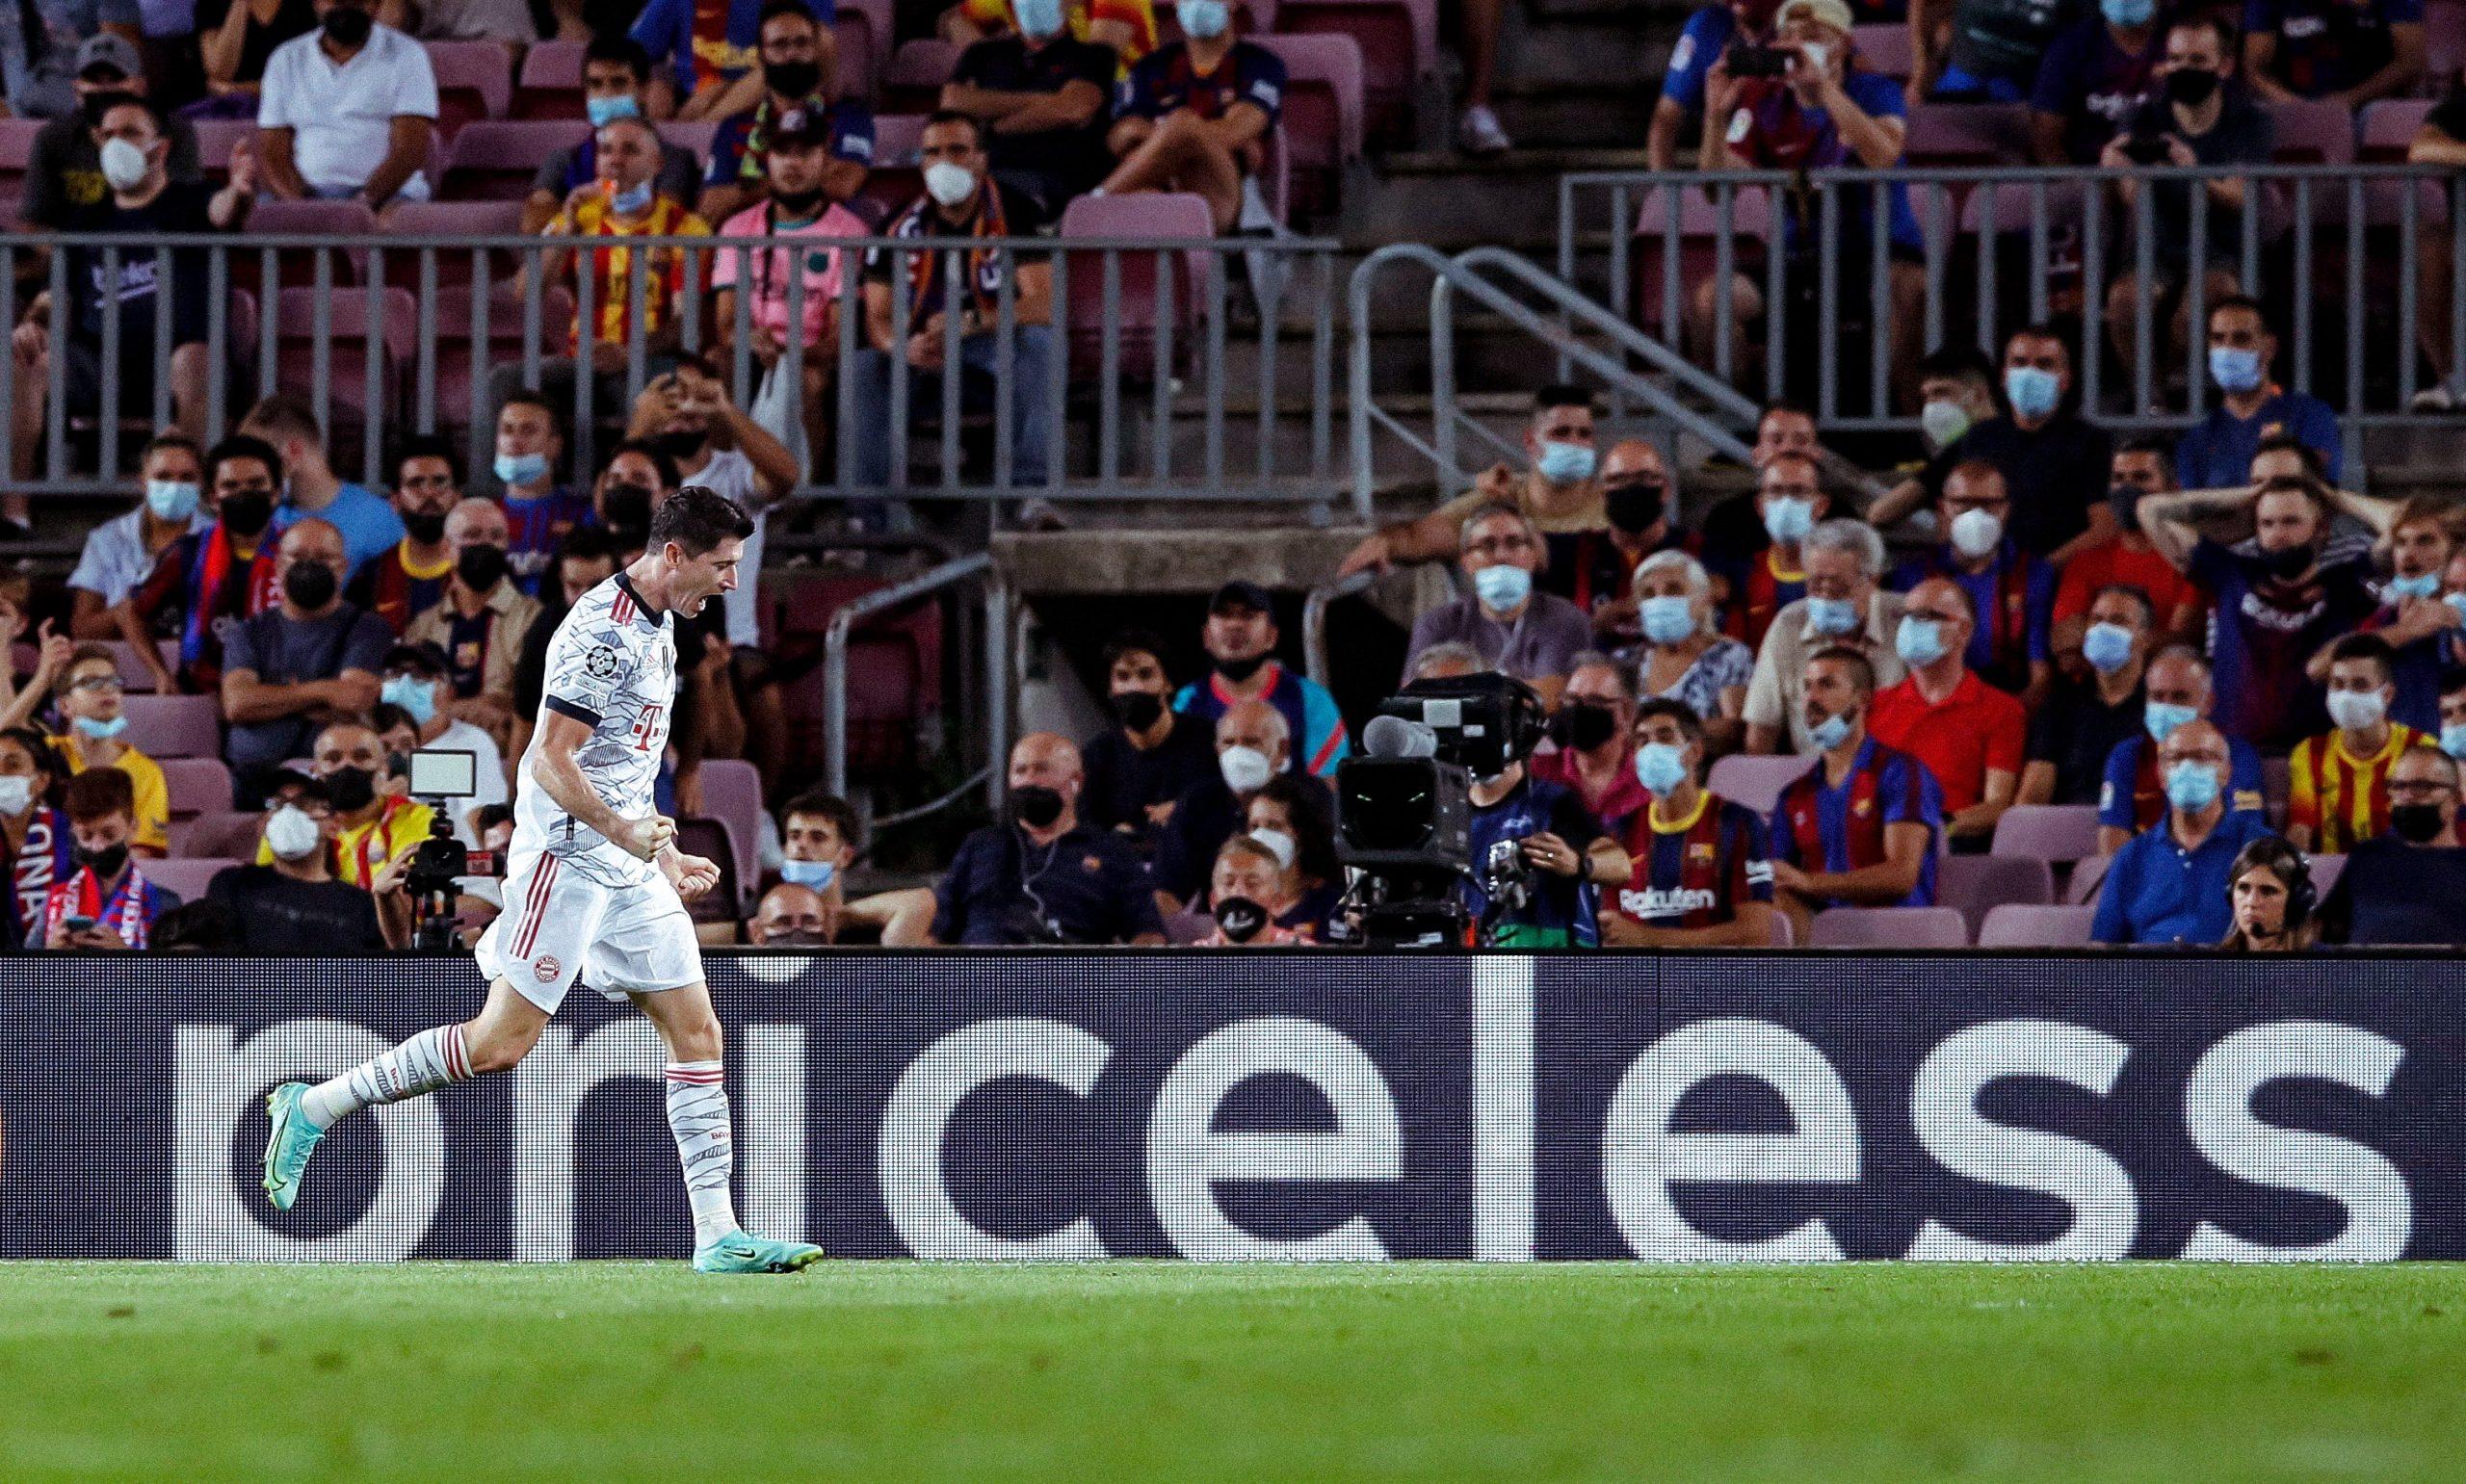 VIDEO/ Bayern Munchen godet sërish Barçën, Juventusi likujdon Malmon